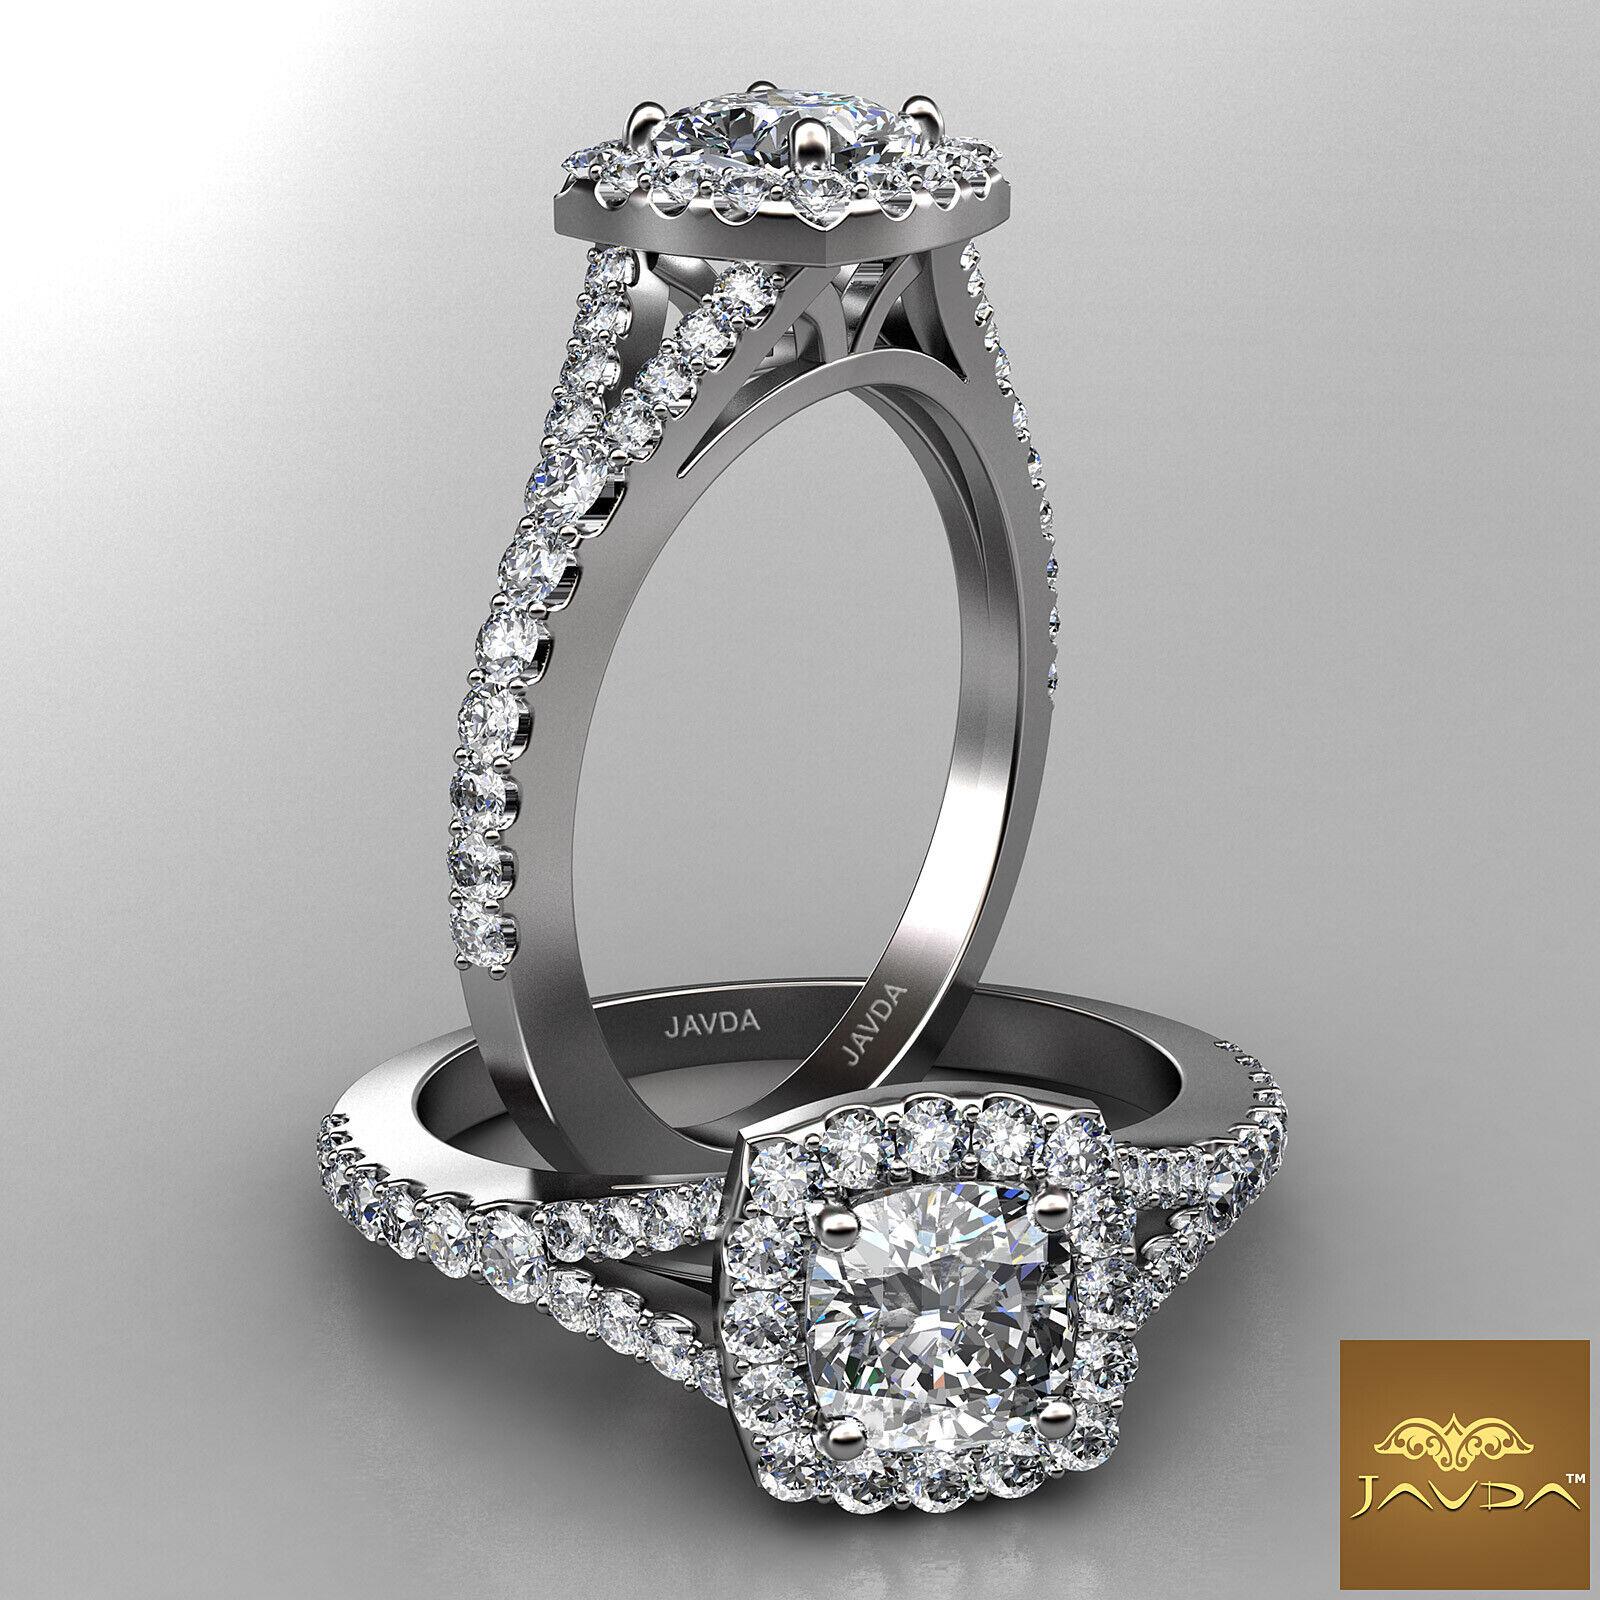 Cushion Shape Diamond Engagement GIA G VVS2 Halo Pre-Set Ring 18k White Gold 1Ct